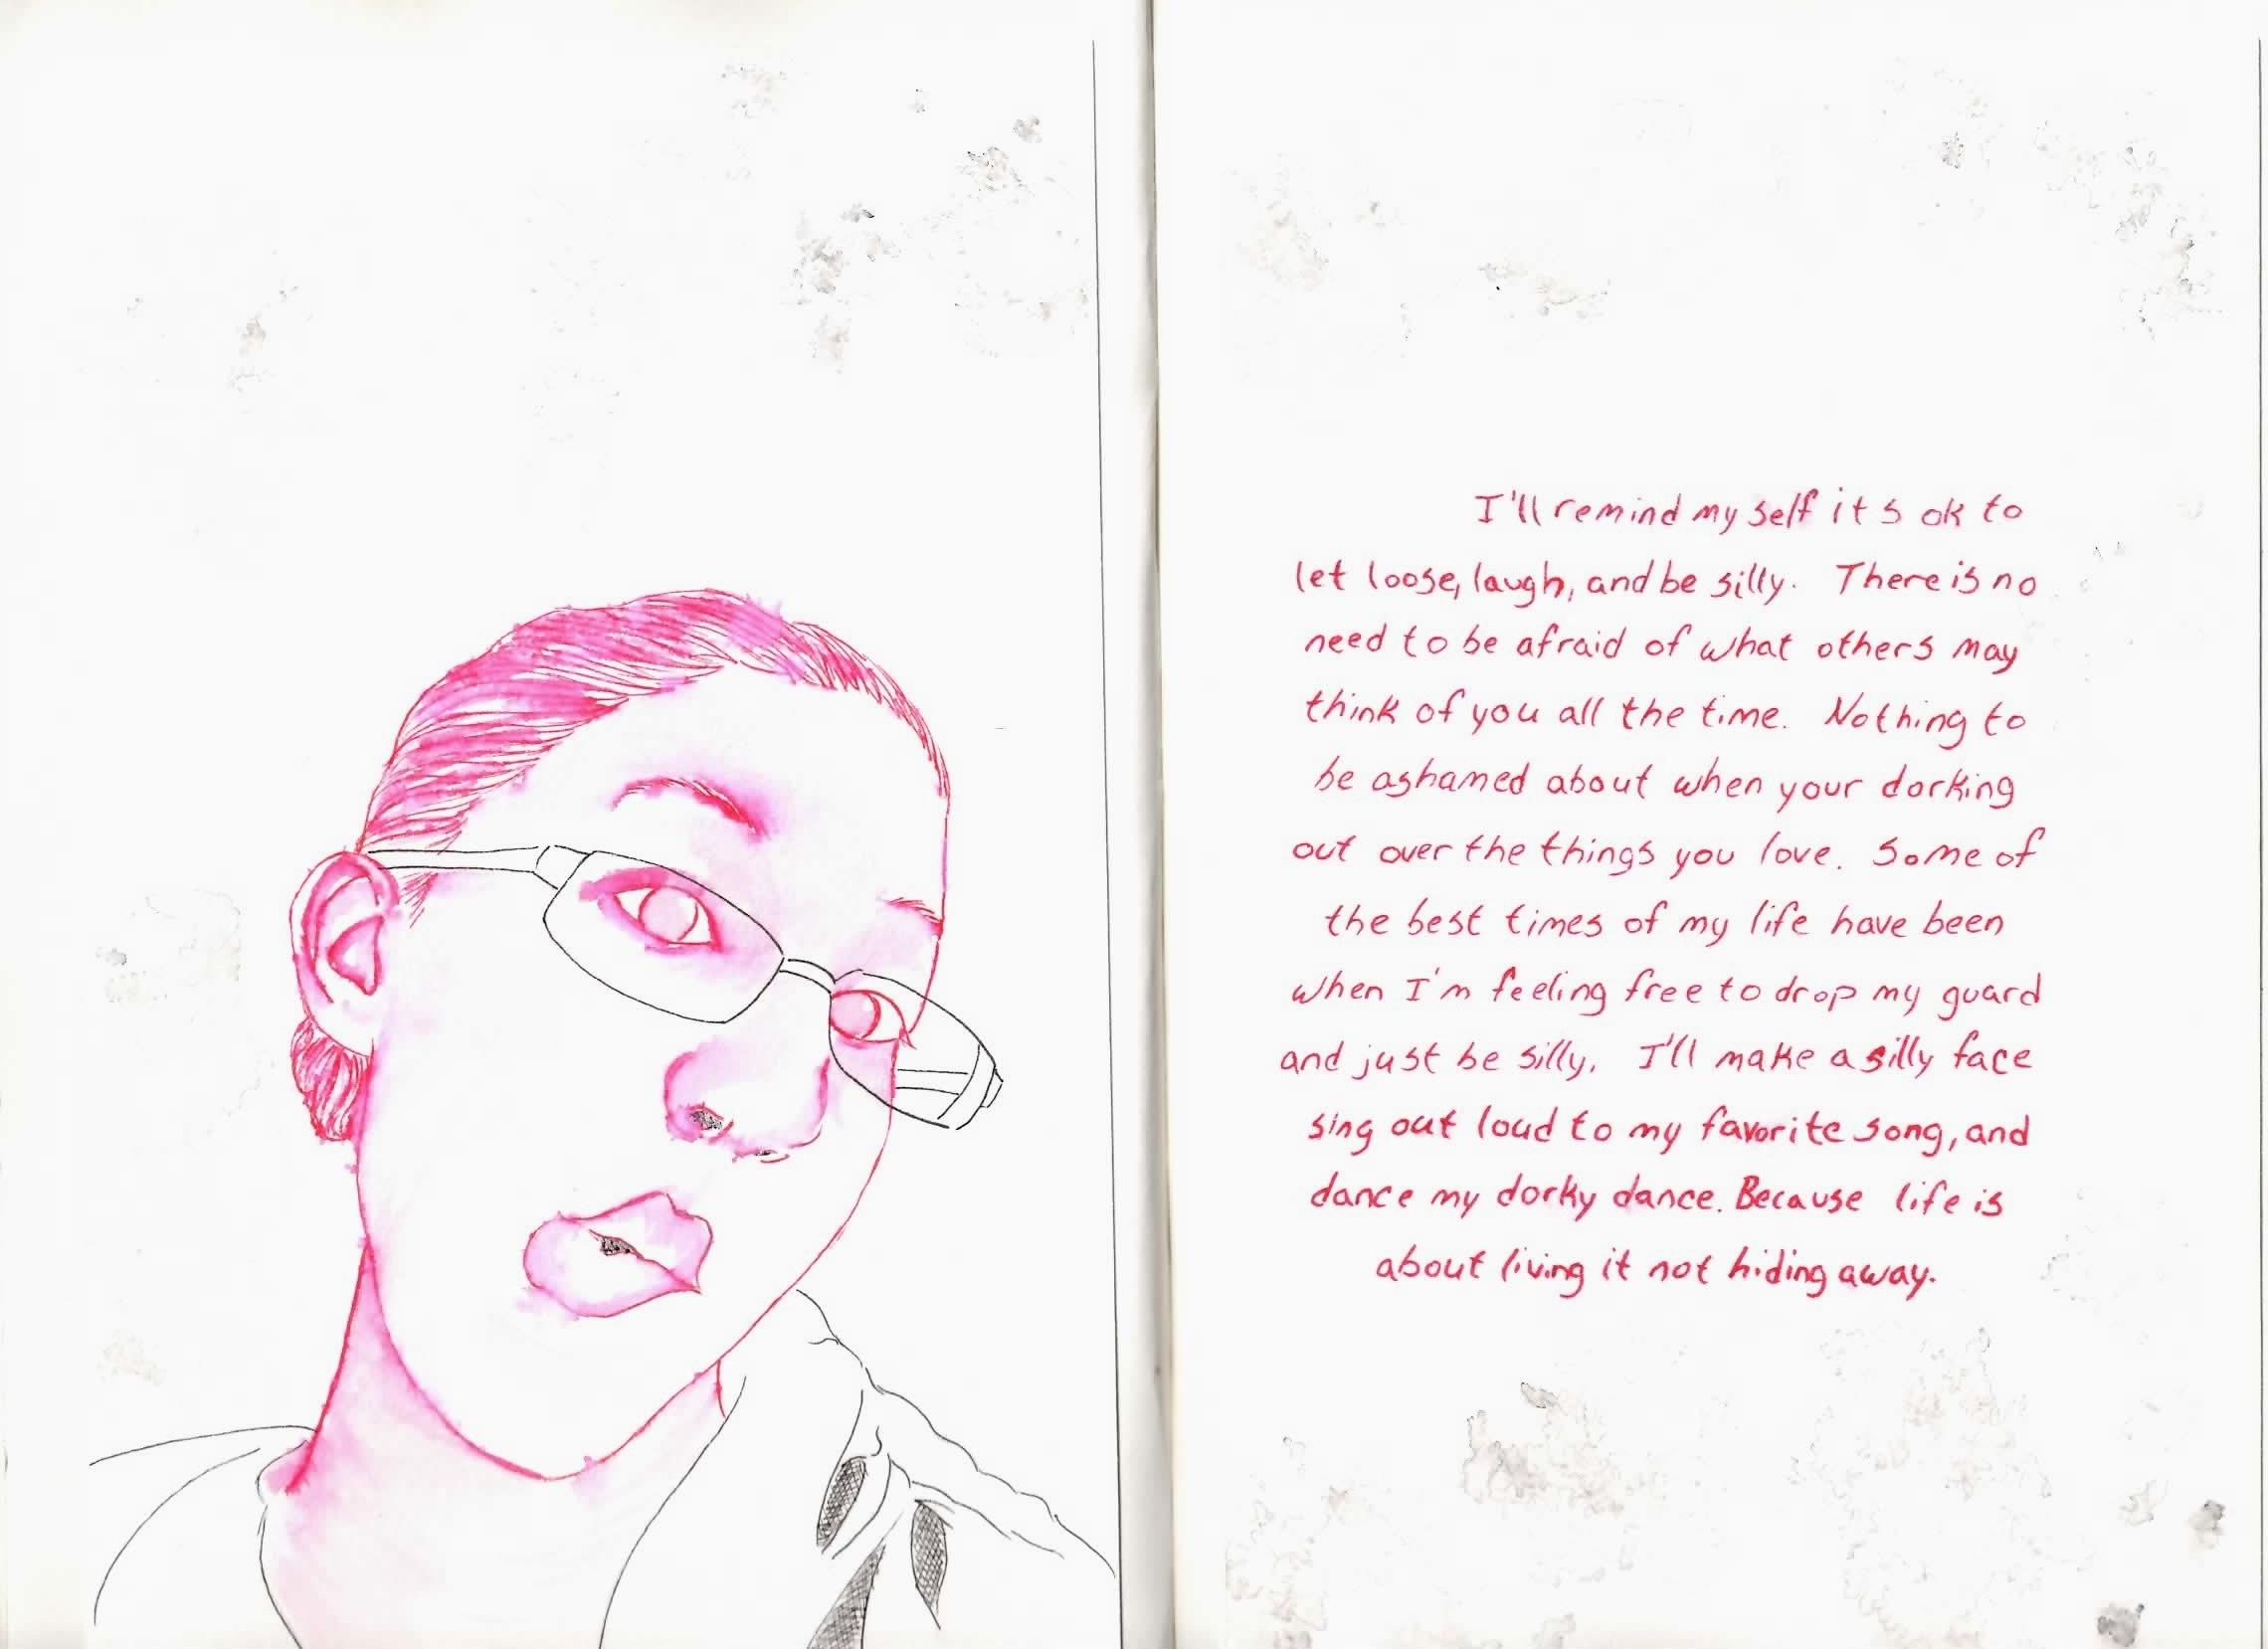 Reflective Self Series 6/21